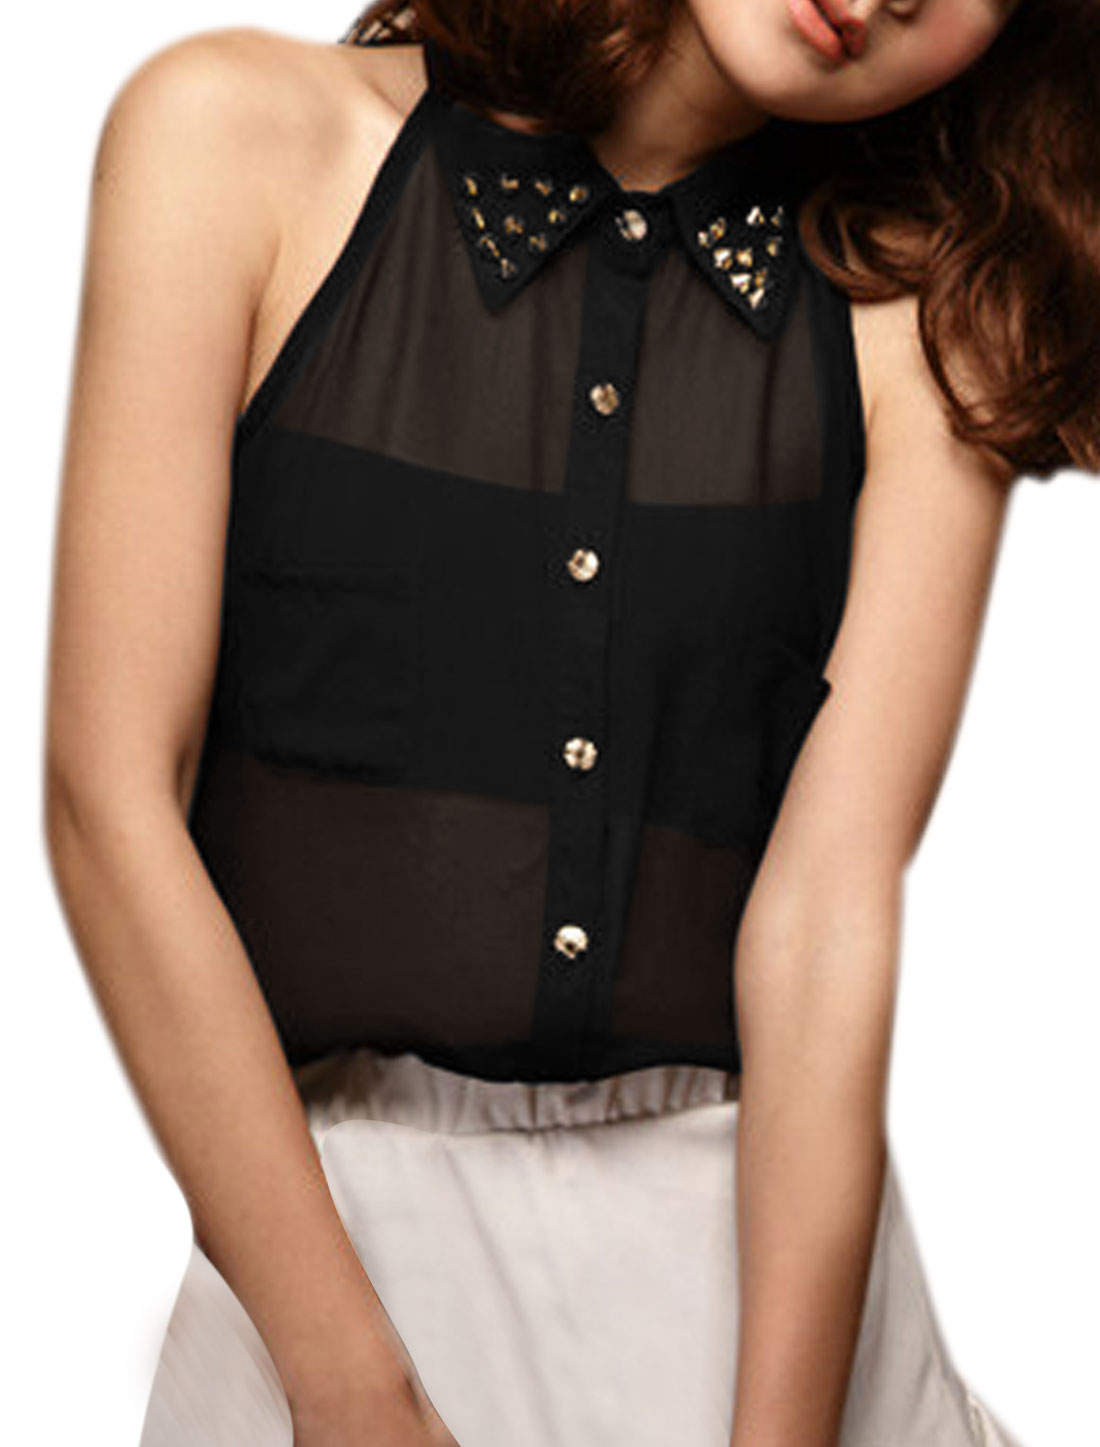 Women Sleeveless Single Breasted Chiffon Fashion Tops Blouses Black XS